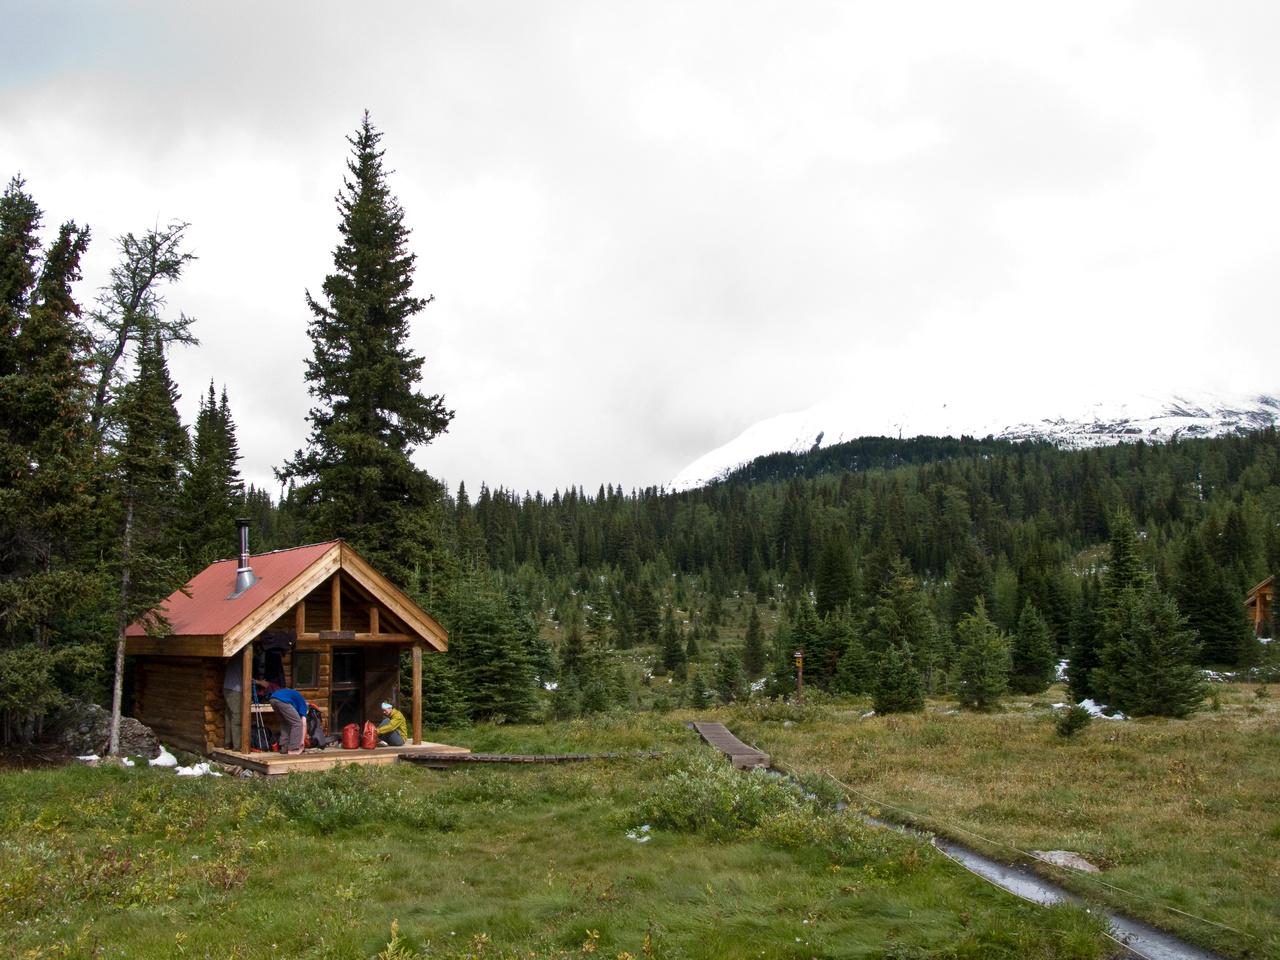 Our cozy sleeping cabin - the Jones Naiset Hut.